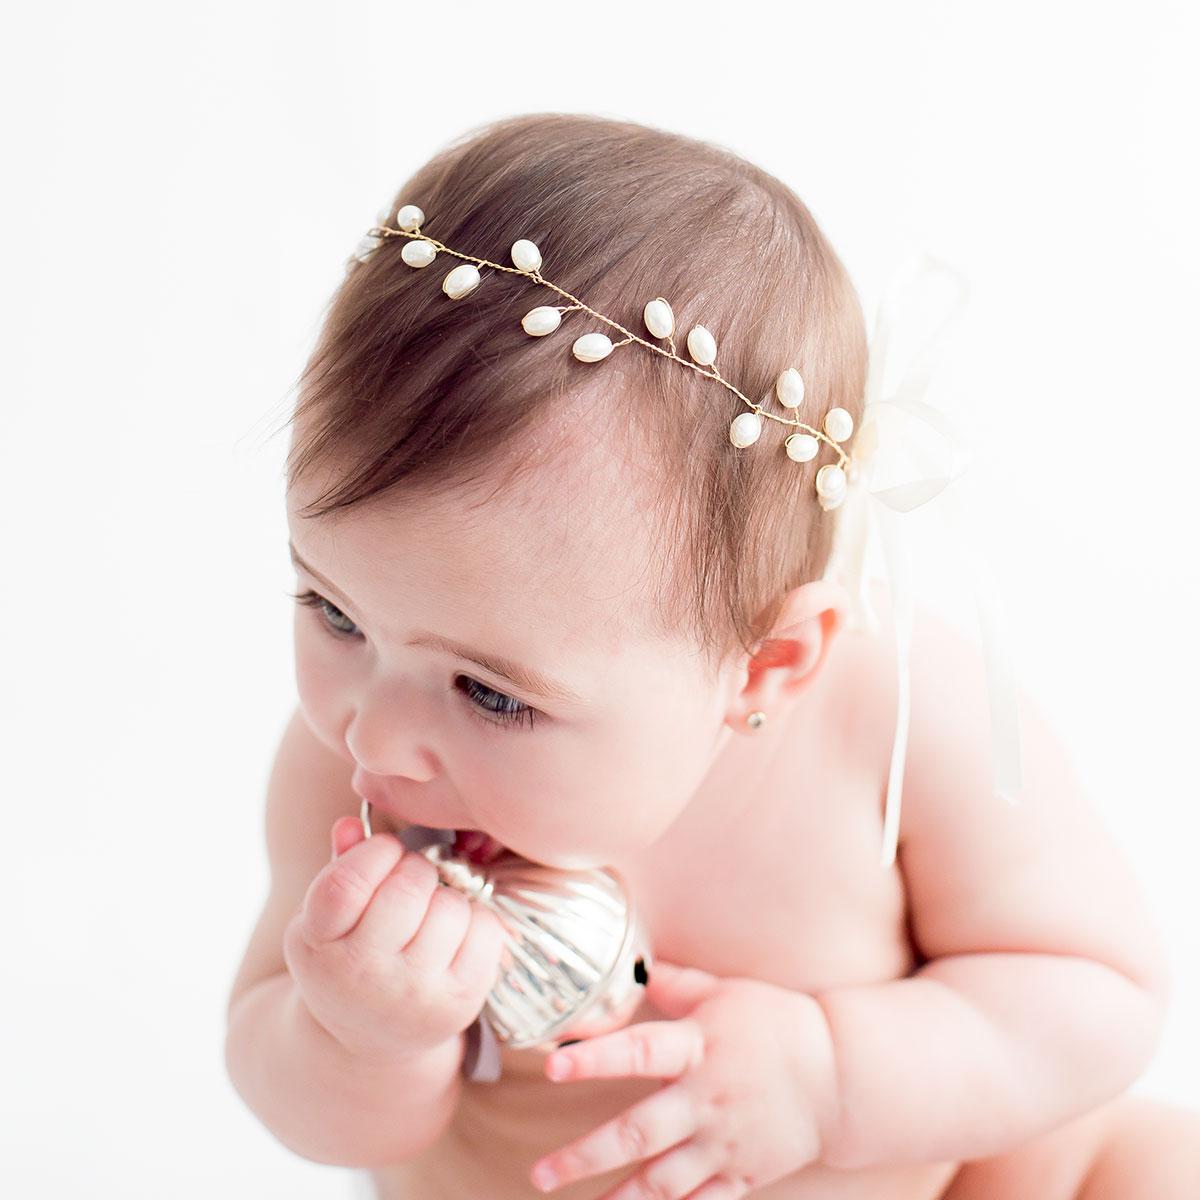 Diademas bebe con perlas